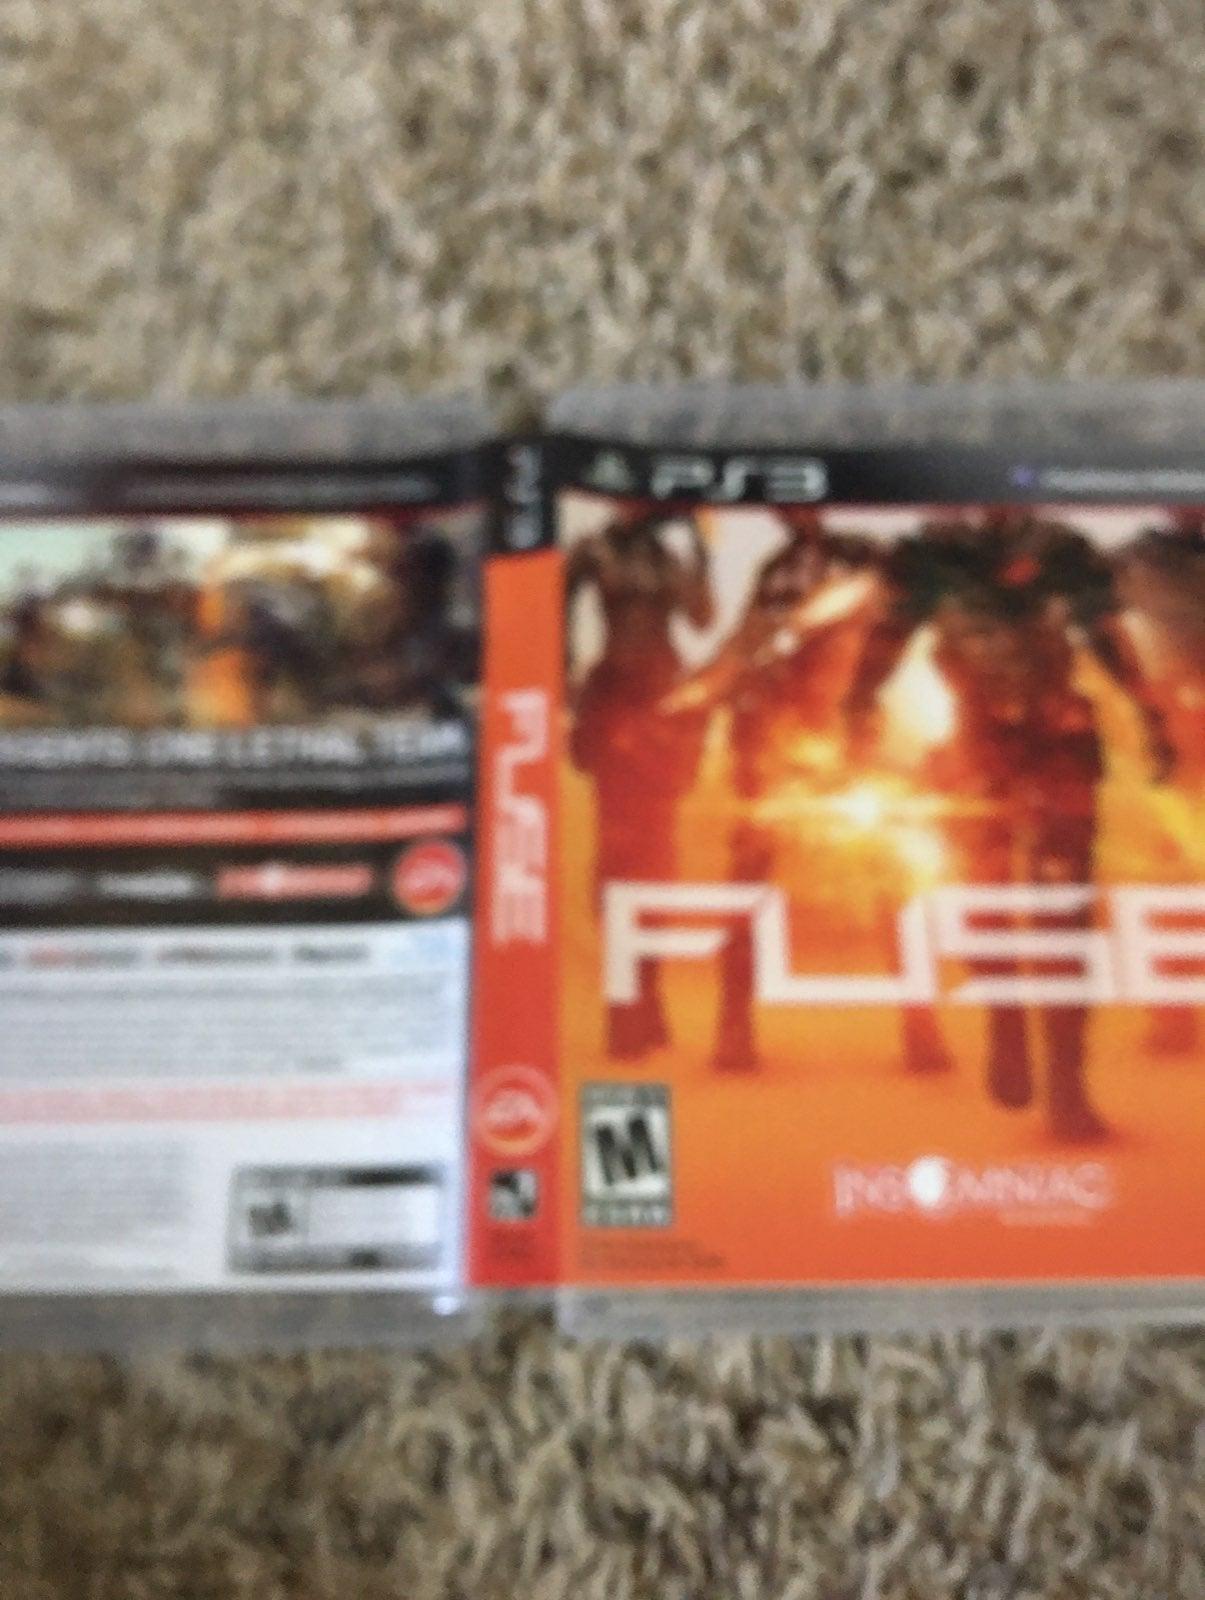 Fuse on Playstation 3